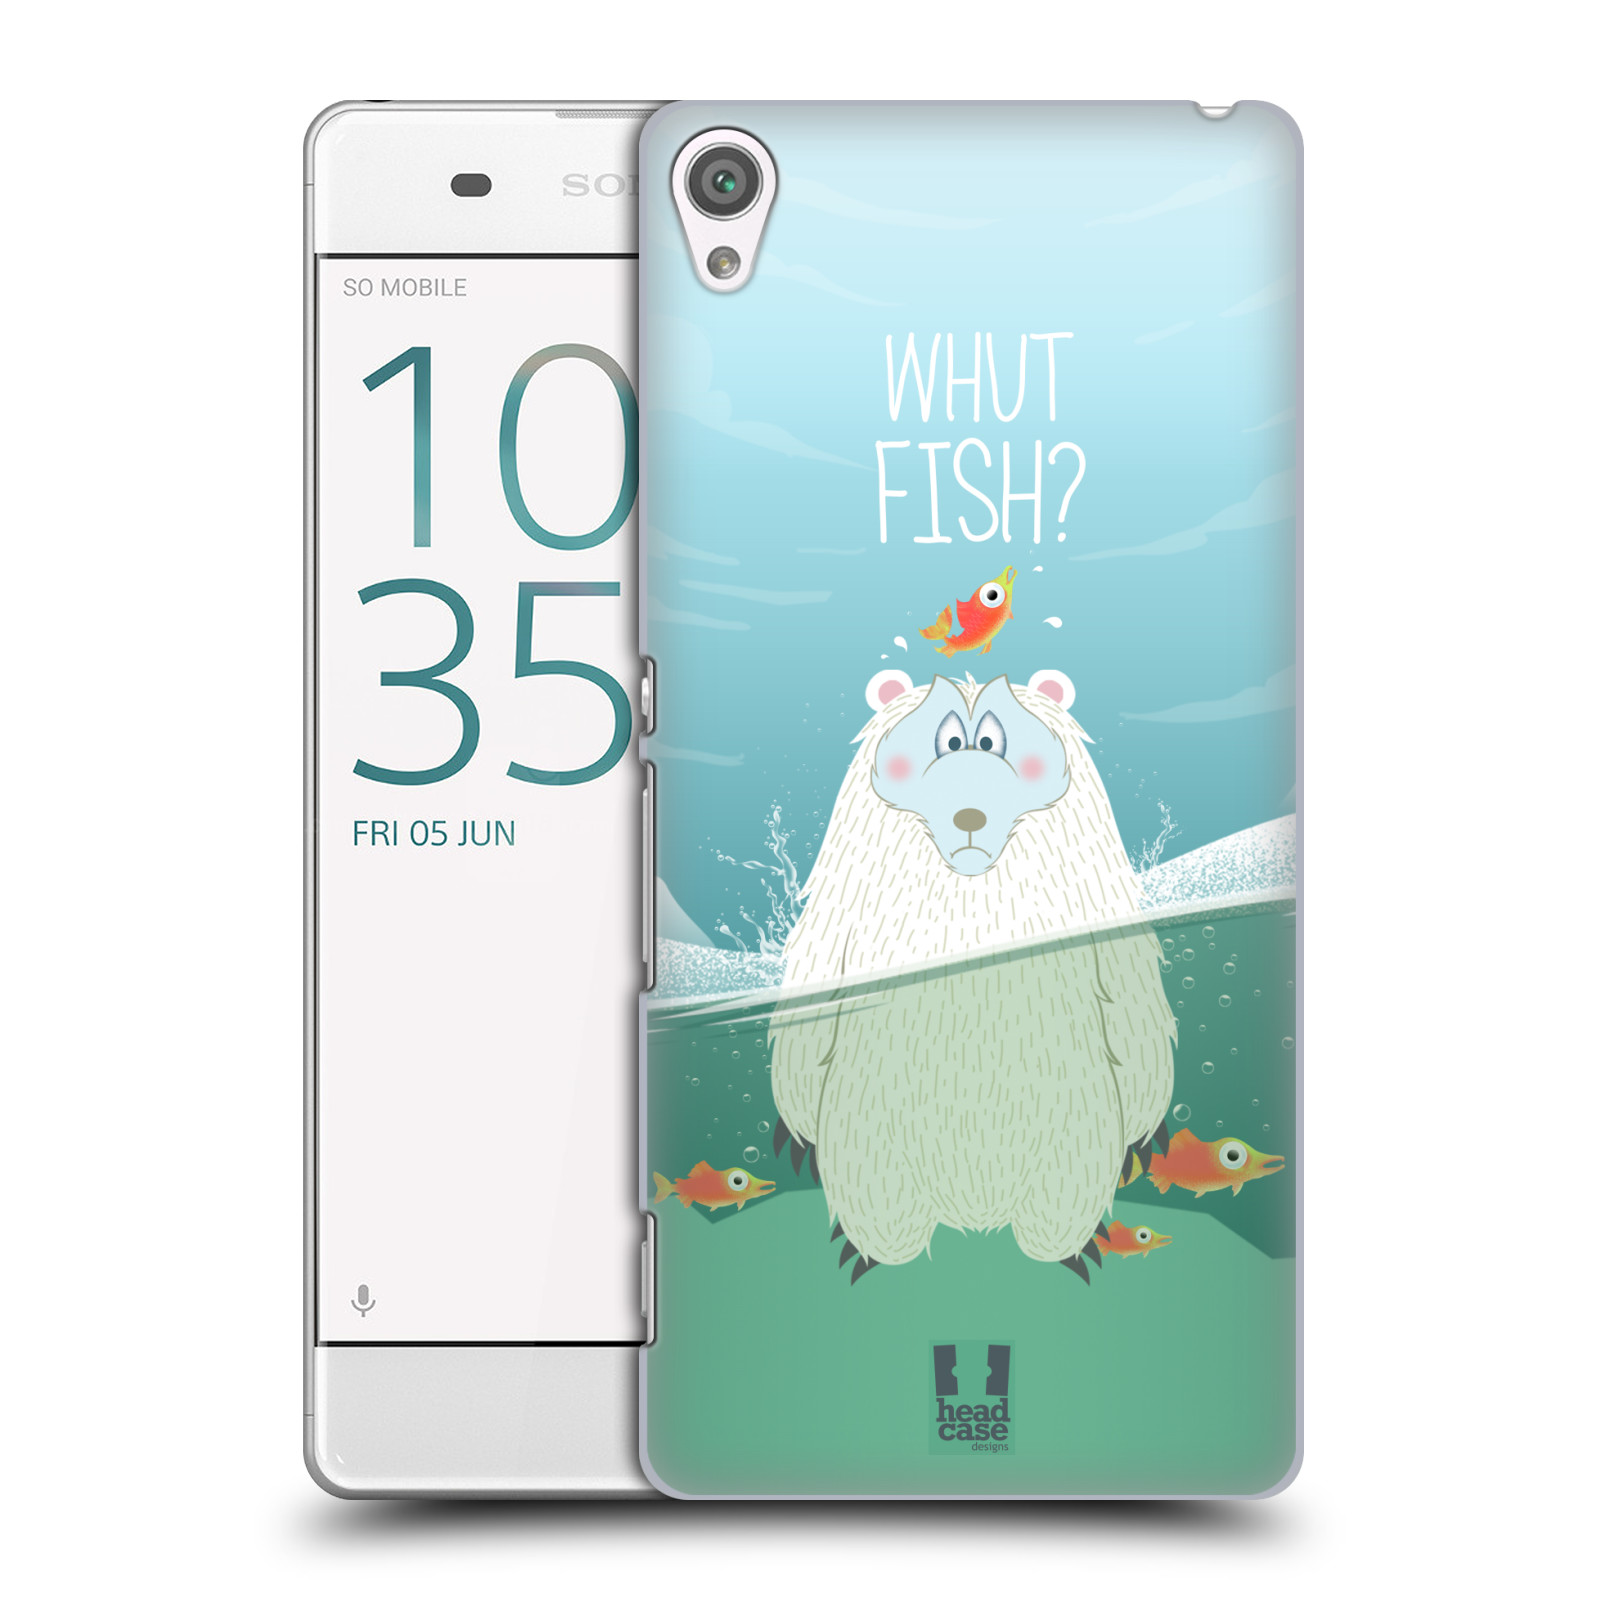 Plastové pouzdro na mobil Sony Xperia XA HEAD CASE Medvěd Whut Fish?